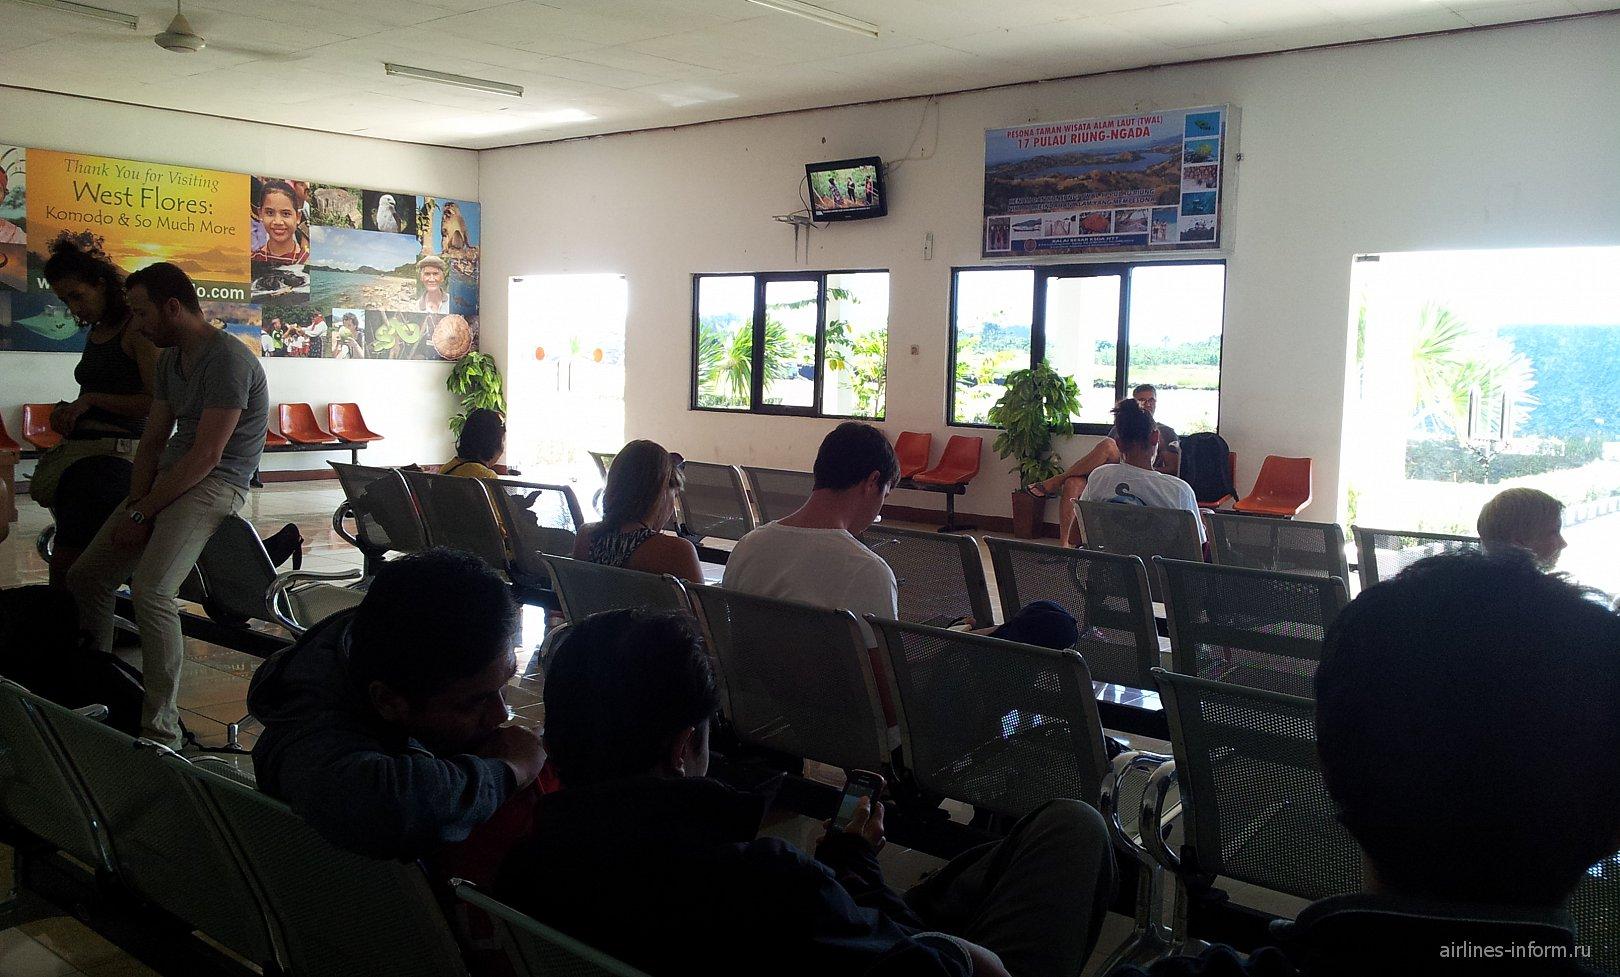 Зал ожидания в аэропорту Комодо Лабуан-Баджо